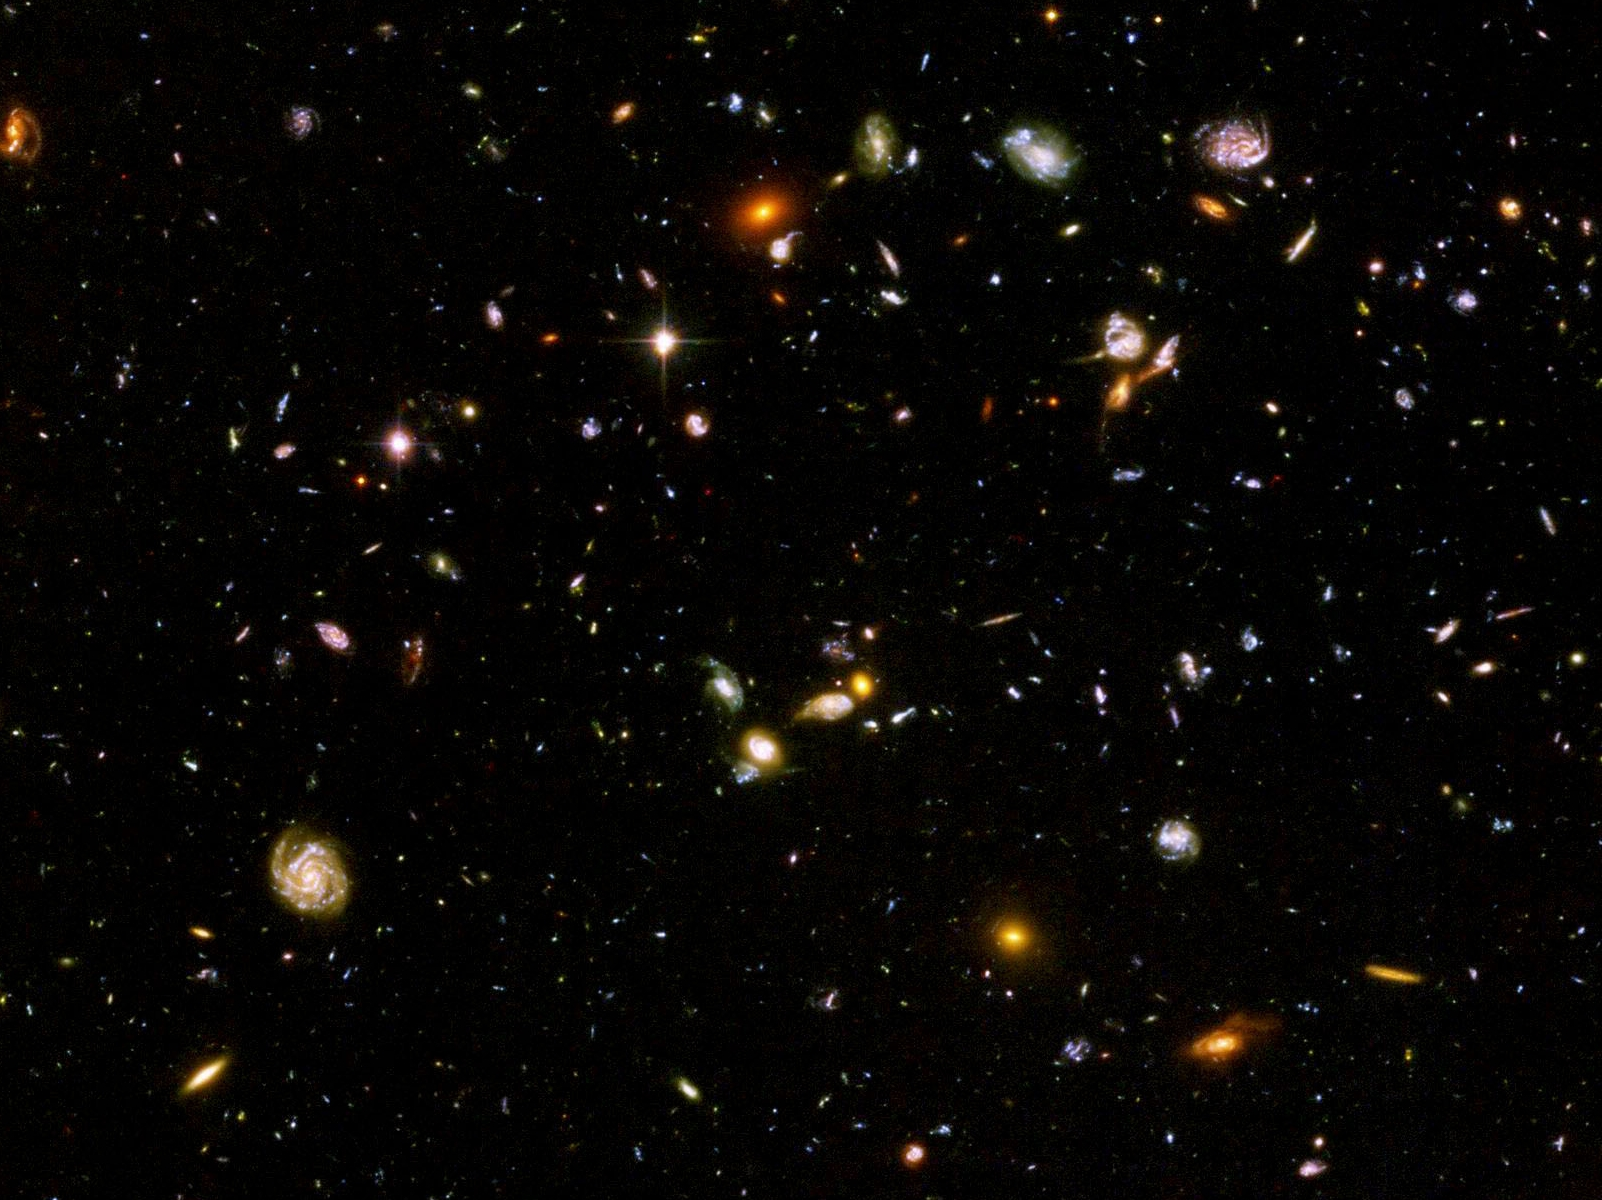 Hubble Ultra Deep Field Wallpaper | 2015 Best Auto Reviews